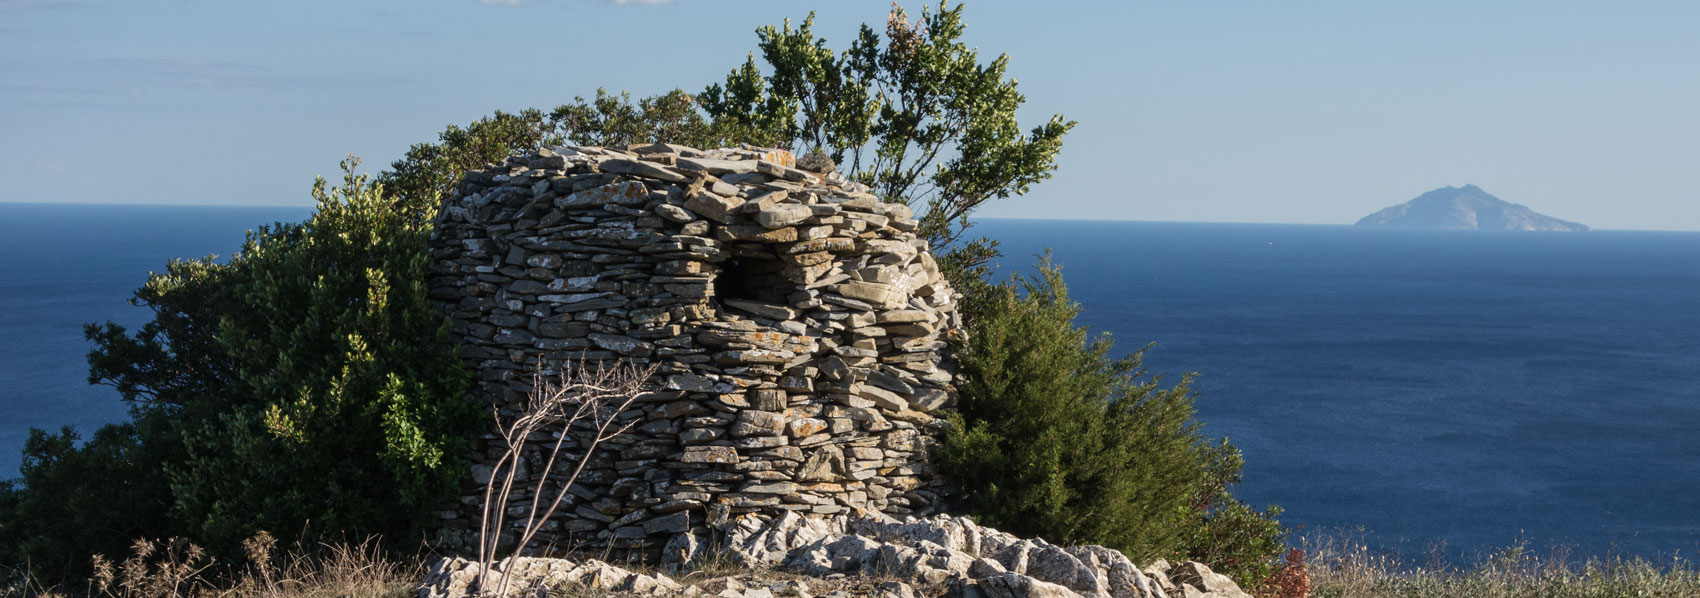 Percorsi Isola d'Elba trekking